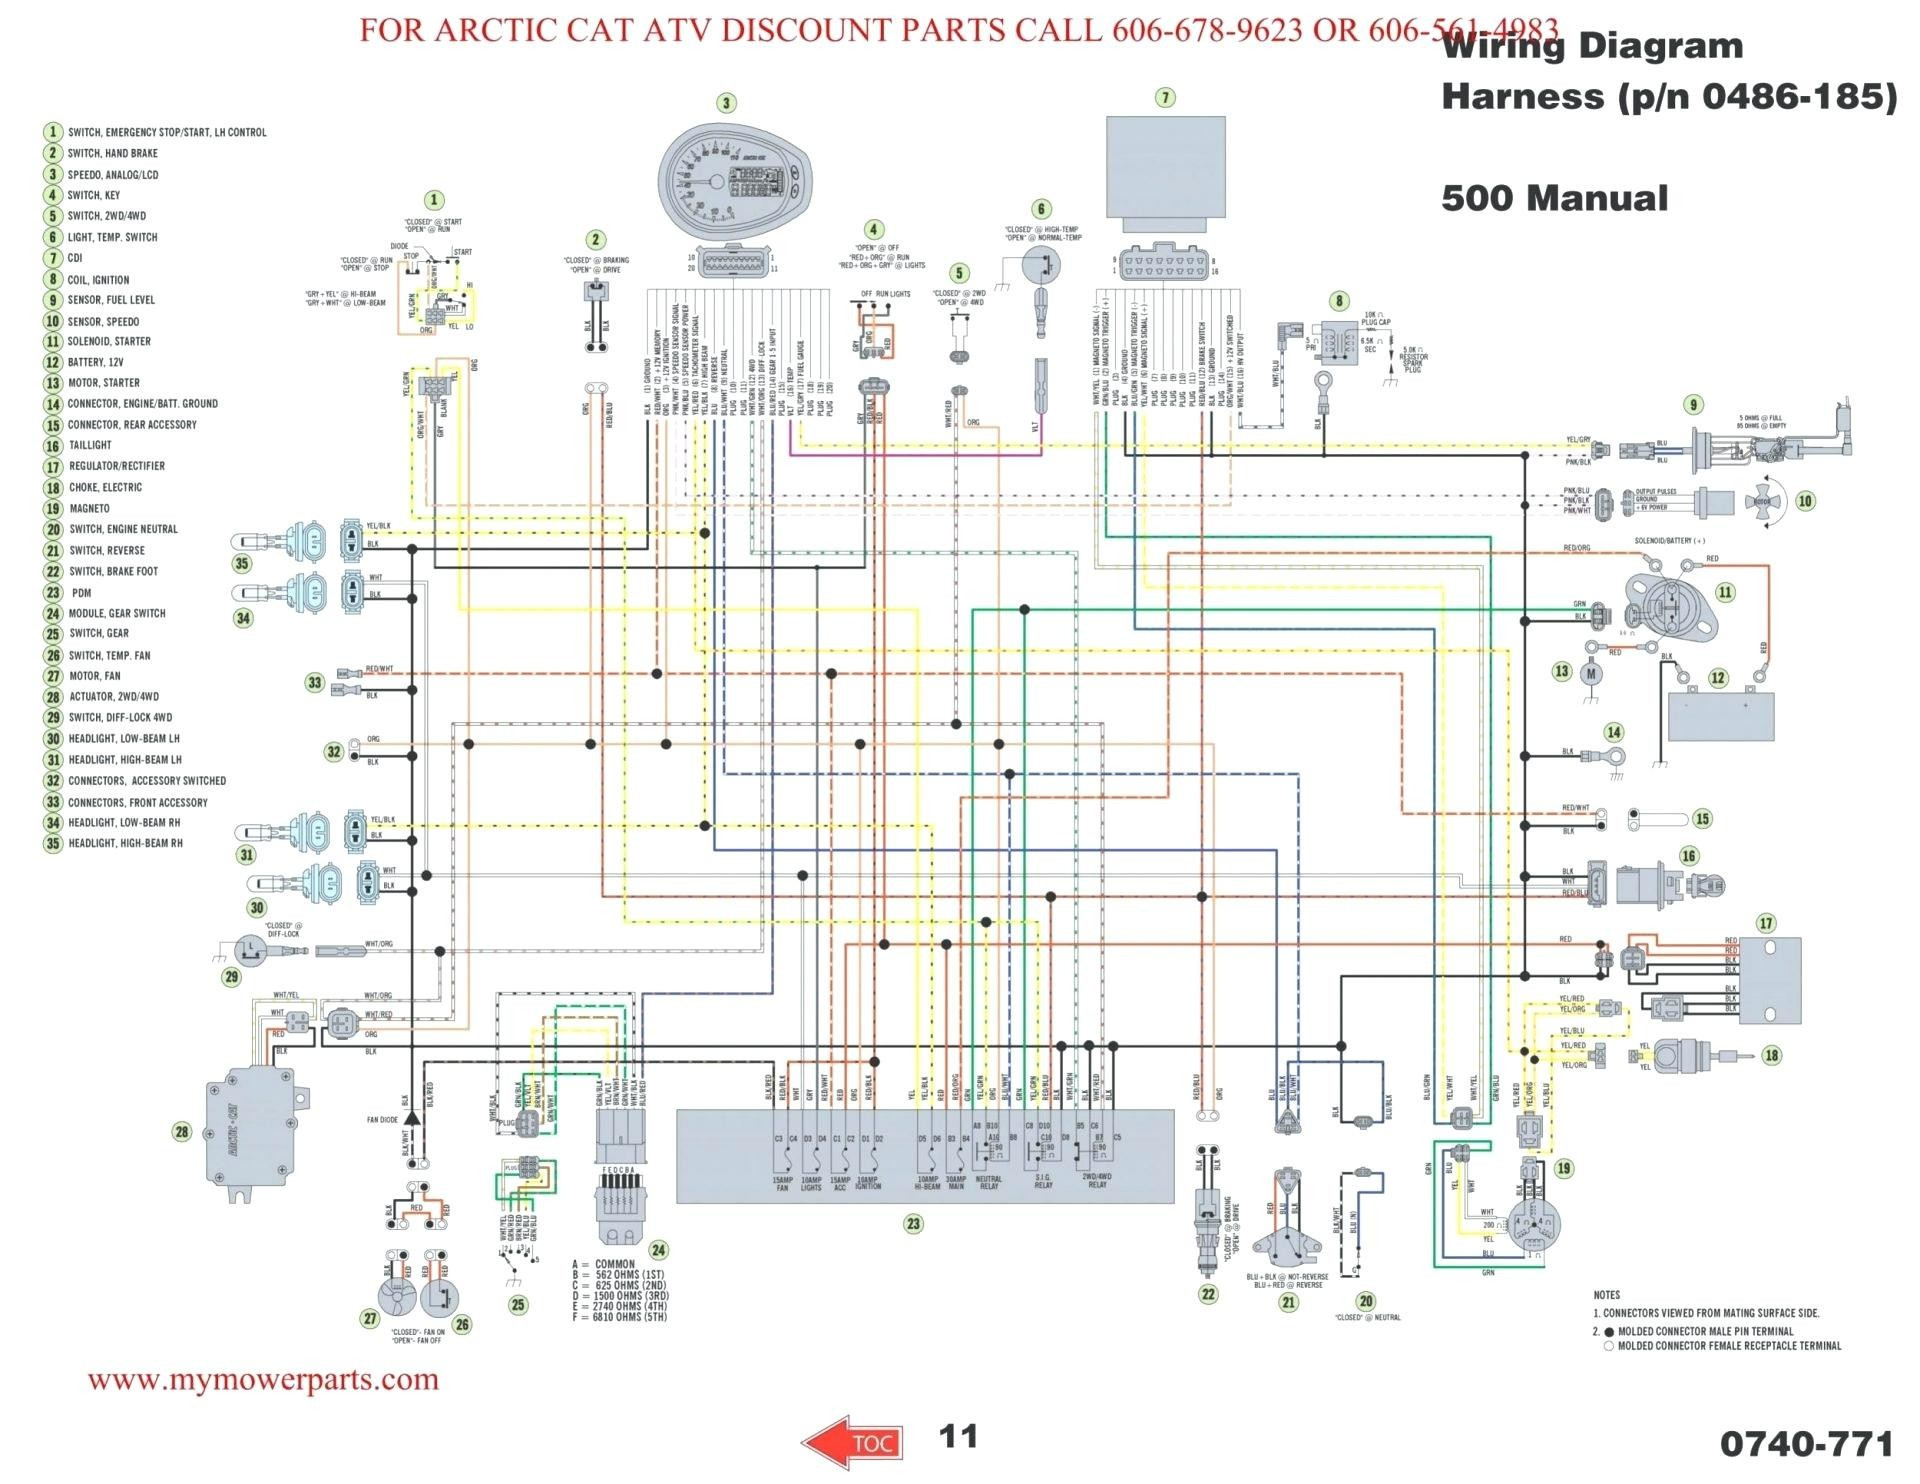 hight resolution of 1980 yamaha xs1100 wiring diagram 1980 yamaha xs1100 wiring diagram mikulskilawoffices of 1980 yamaha xs1100 wiring